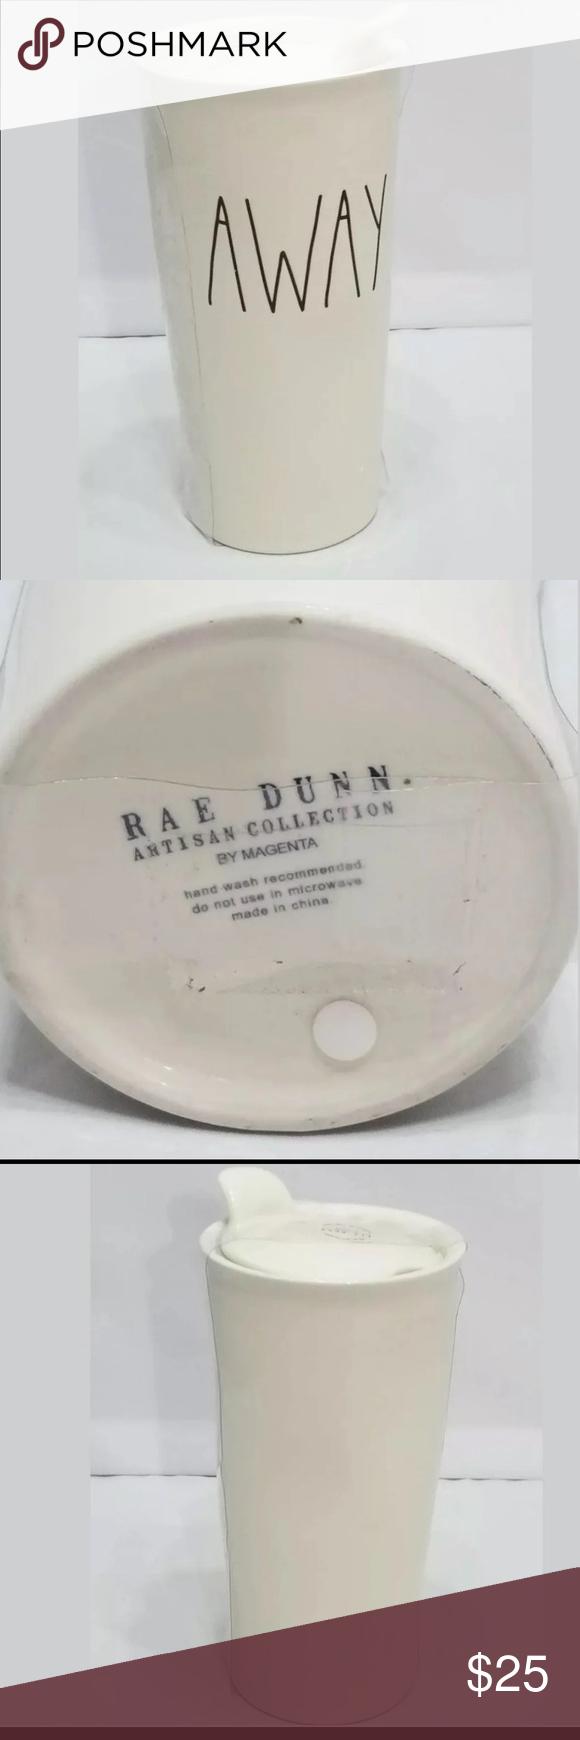 Rae Dunn 'AWAY' Travel Mug with Lid NWT Authentic Rae Dunn